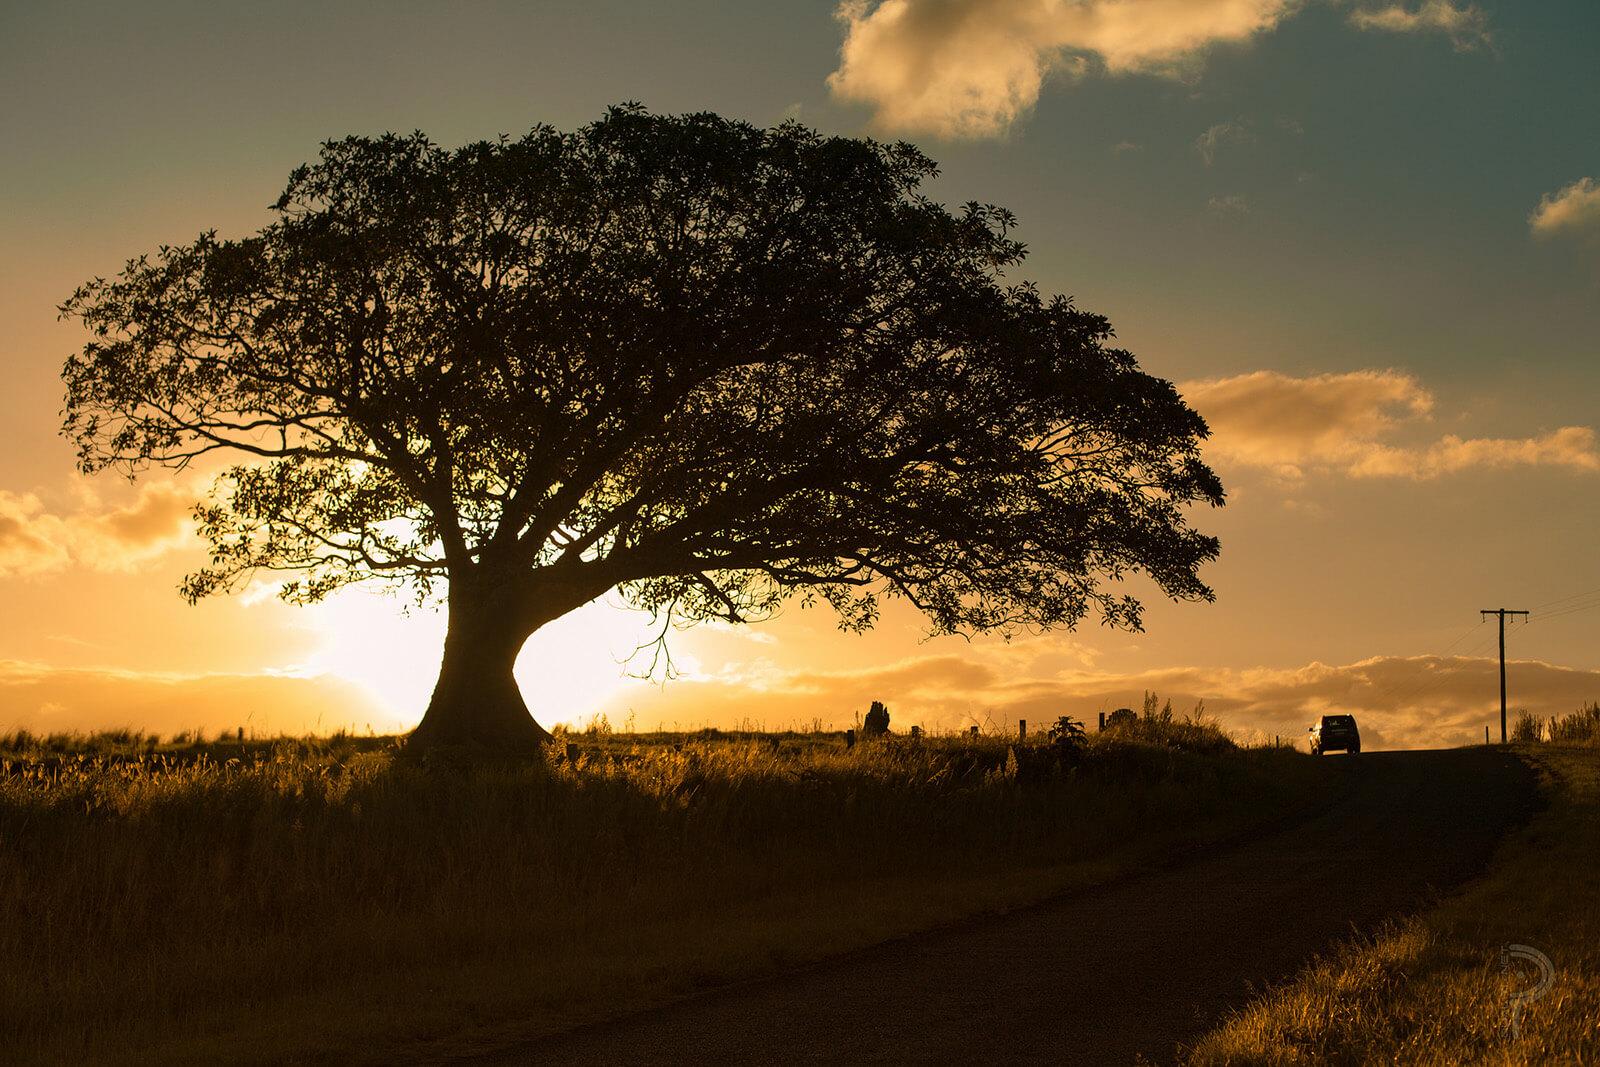 Sunset at Conondale National Park in Queensland, Australia